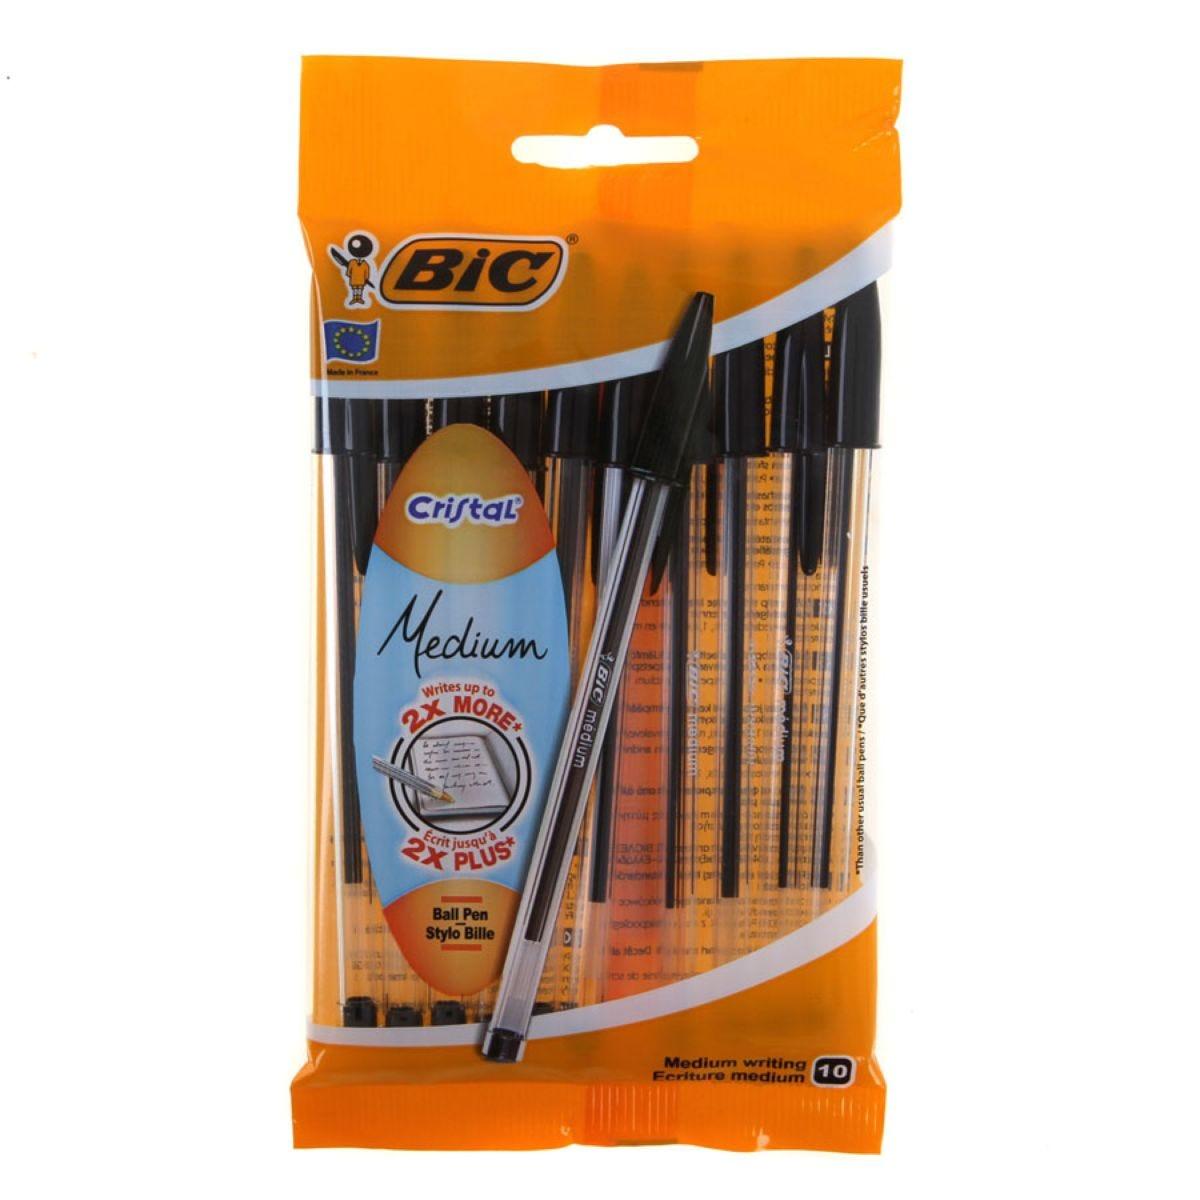 Bic Cristal Medium Ballpoint Pens – Pack of 10, Black